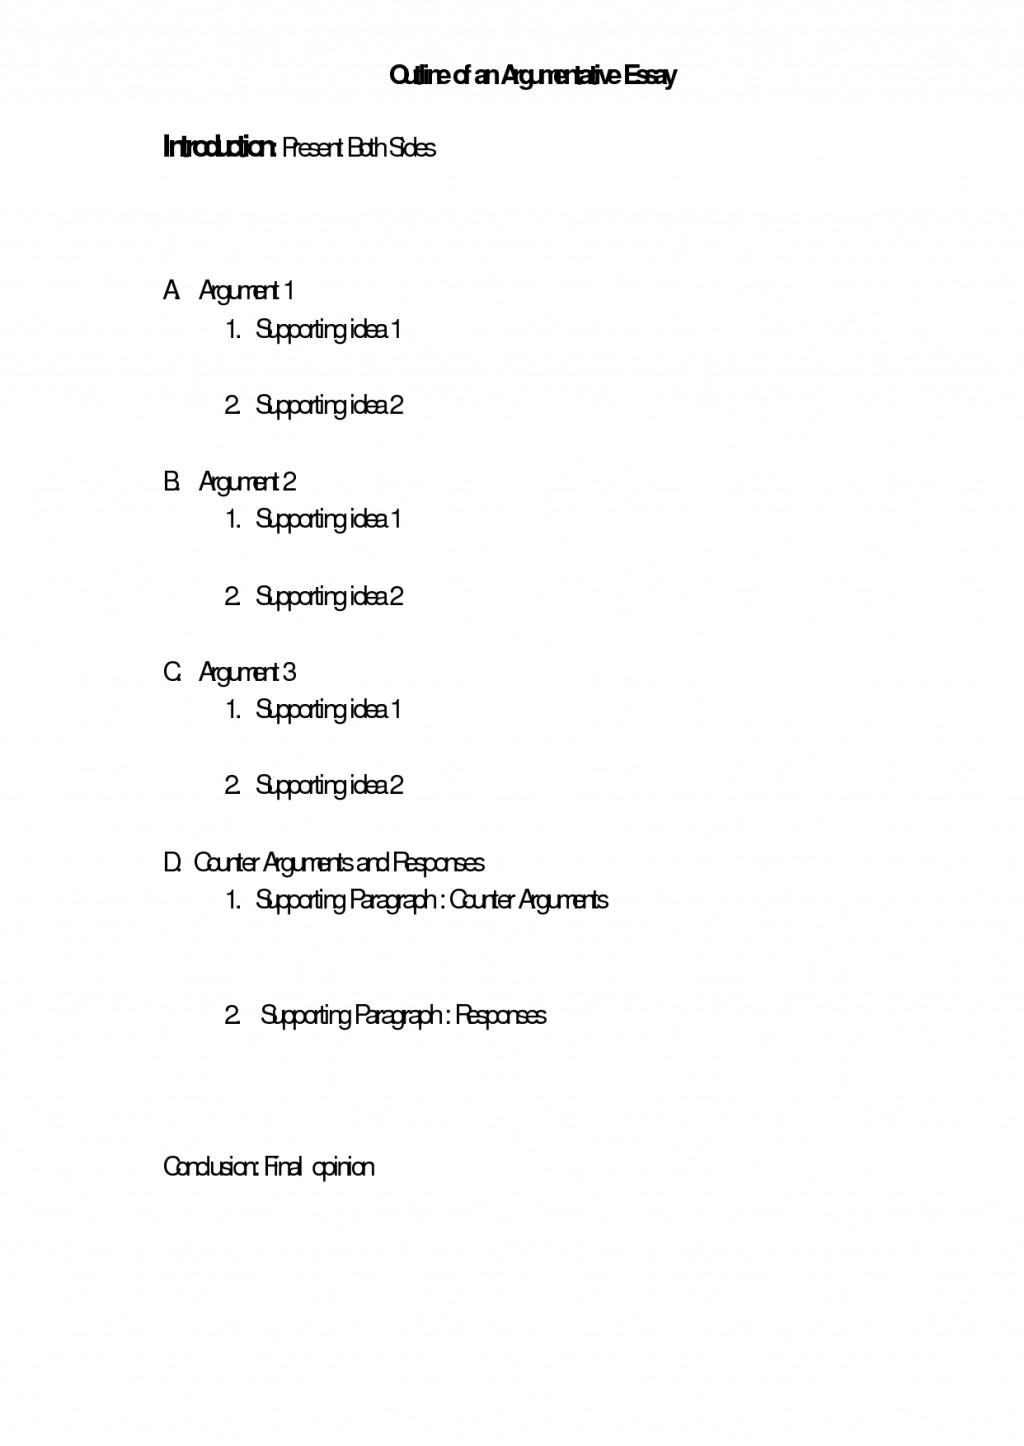 010 Argumentative Essay Structure How To Write An Outline Www Vikingsna Org At Ex Igcse Example Esl Ppt Rebuttal Ielts Pdf Imposing Worksheet Large